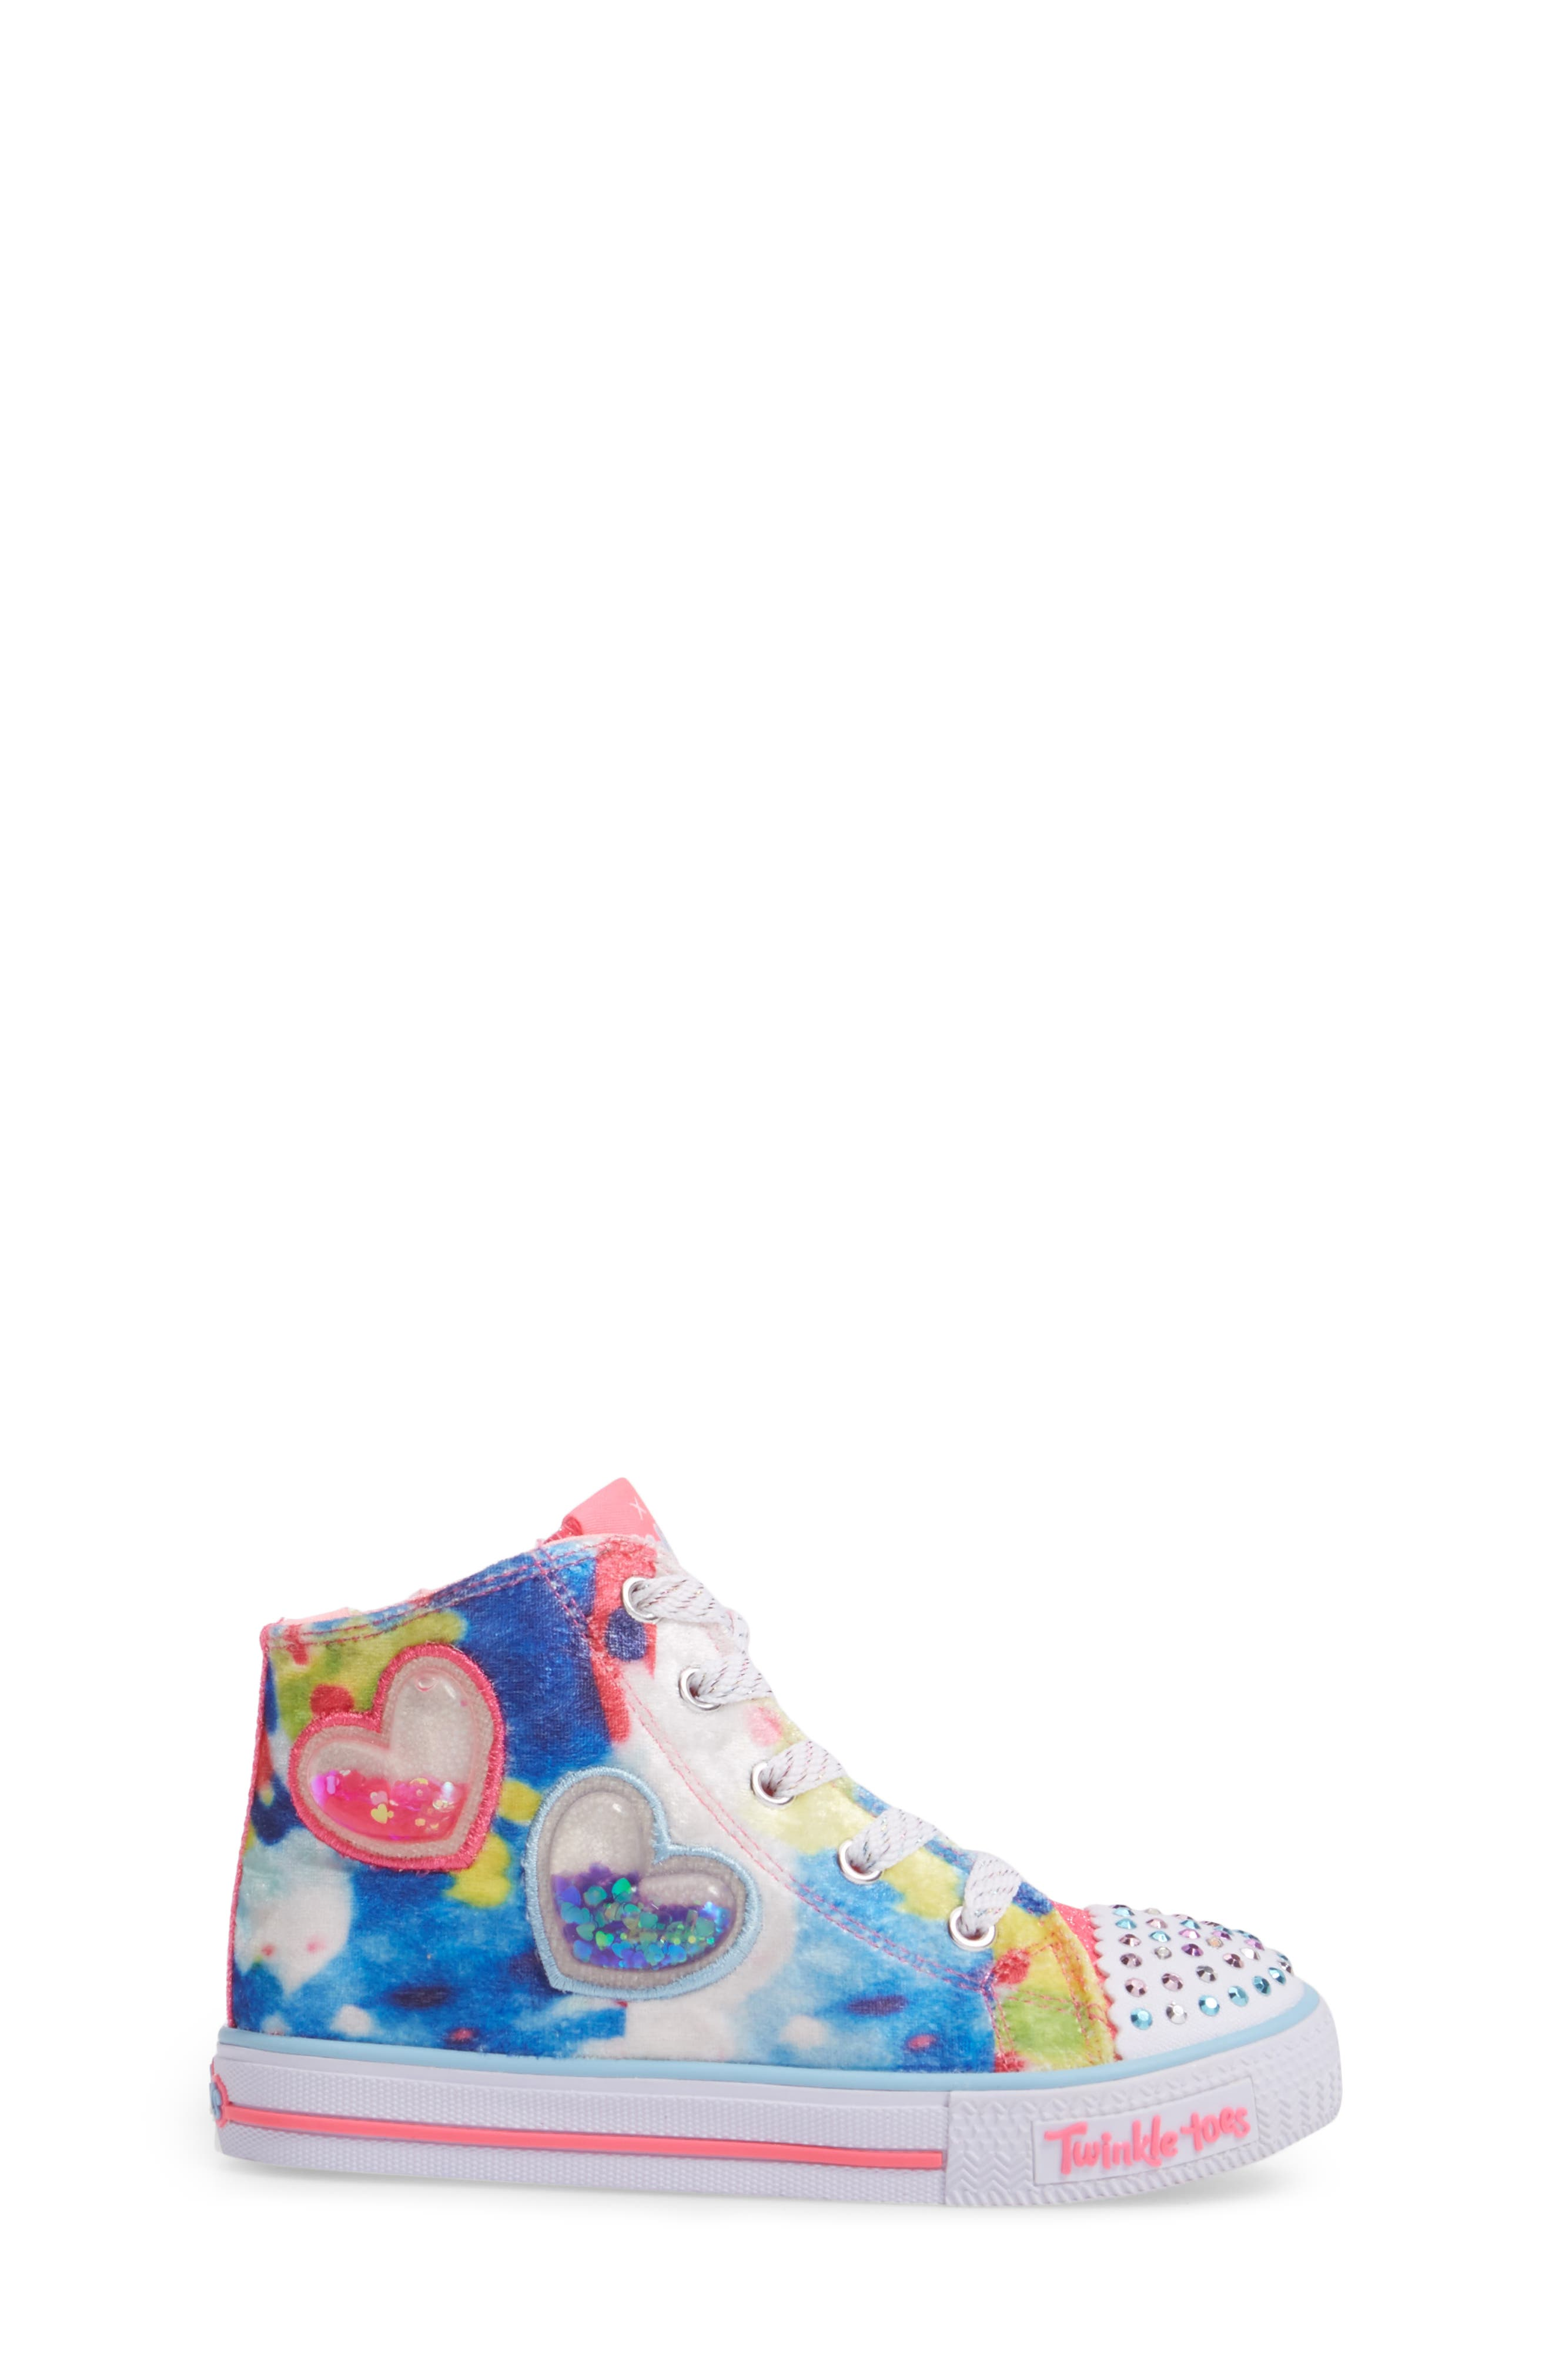 Alternate Image 3  - SKECHERS Twinkle Toes Shuffles Light-Up High Top Sneaker (Walker & Toddler)